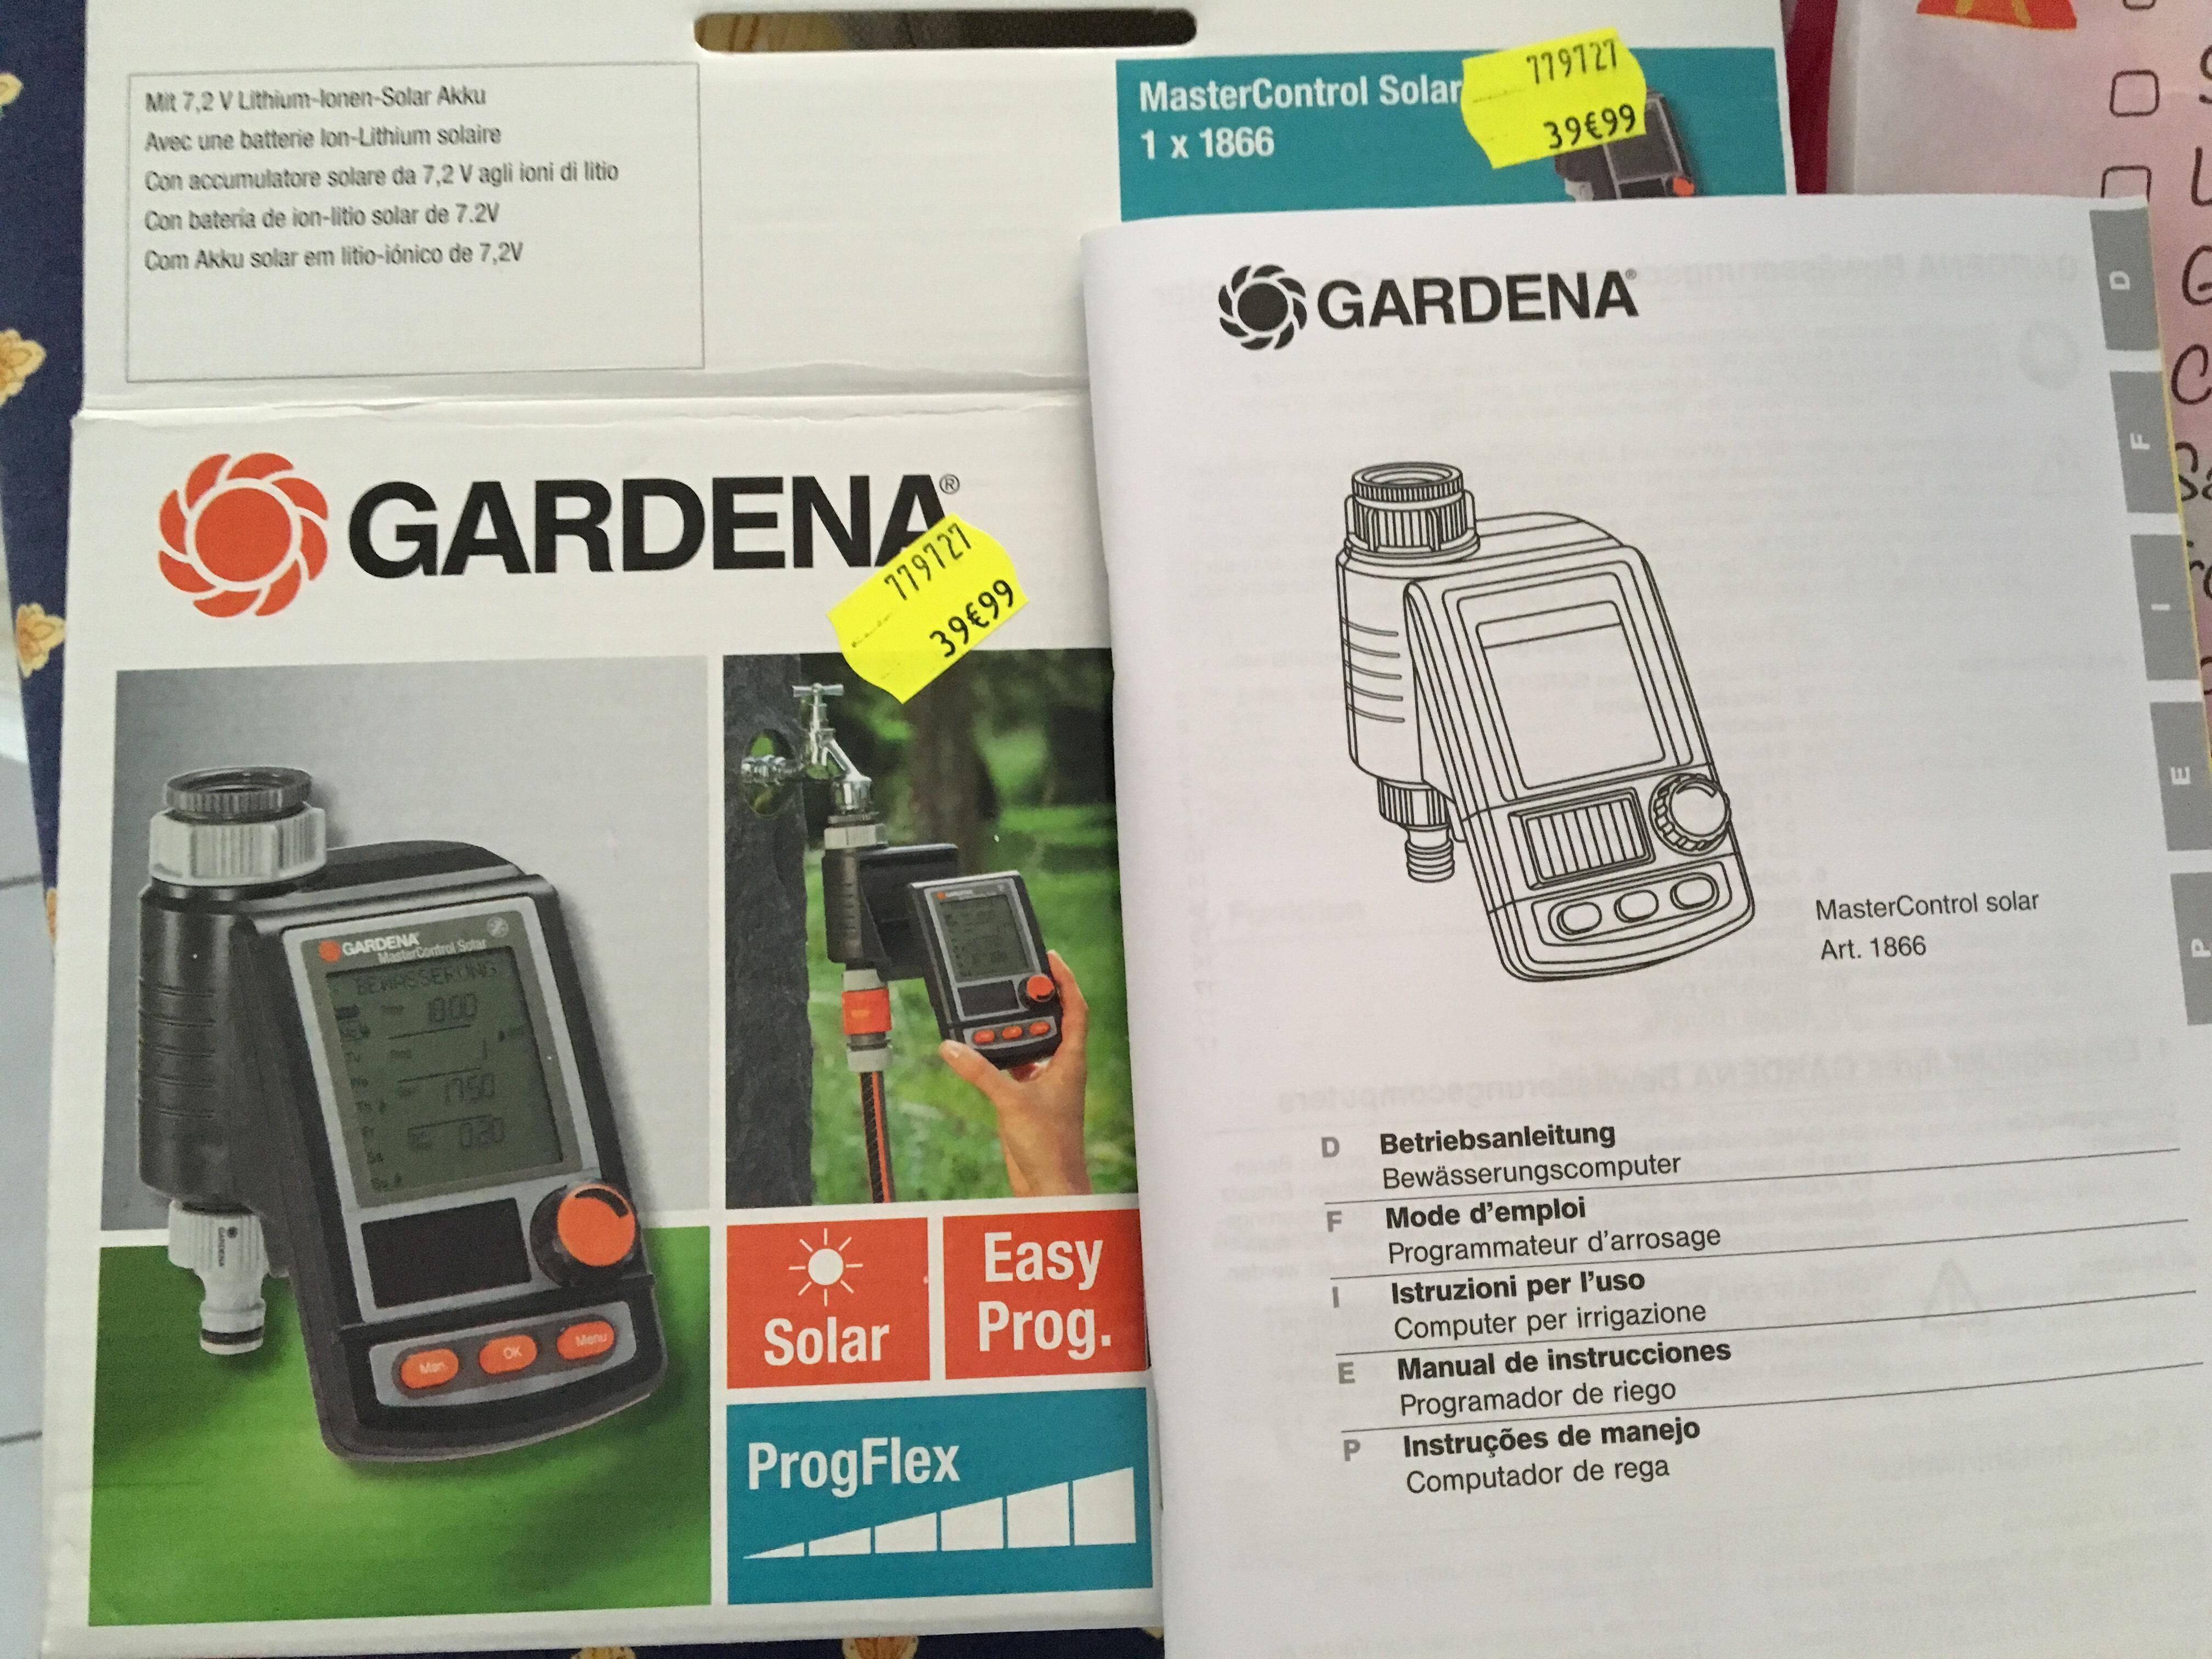 Programmateur d'arrosage Gardena Mastercontrol Solar Plus C1060 1866